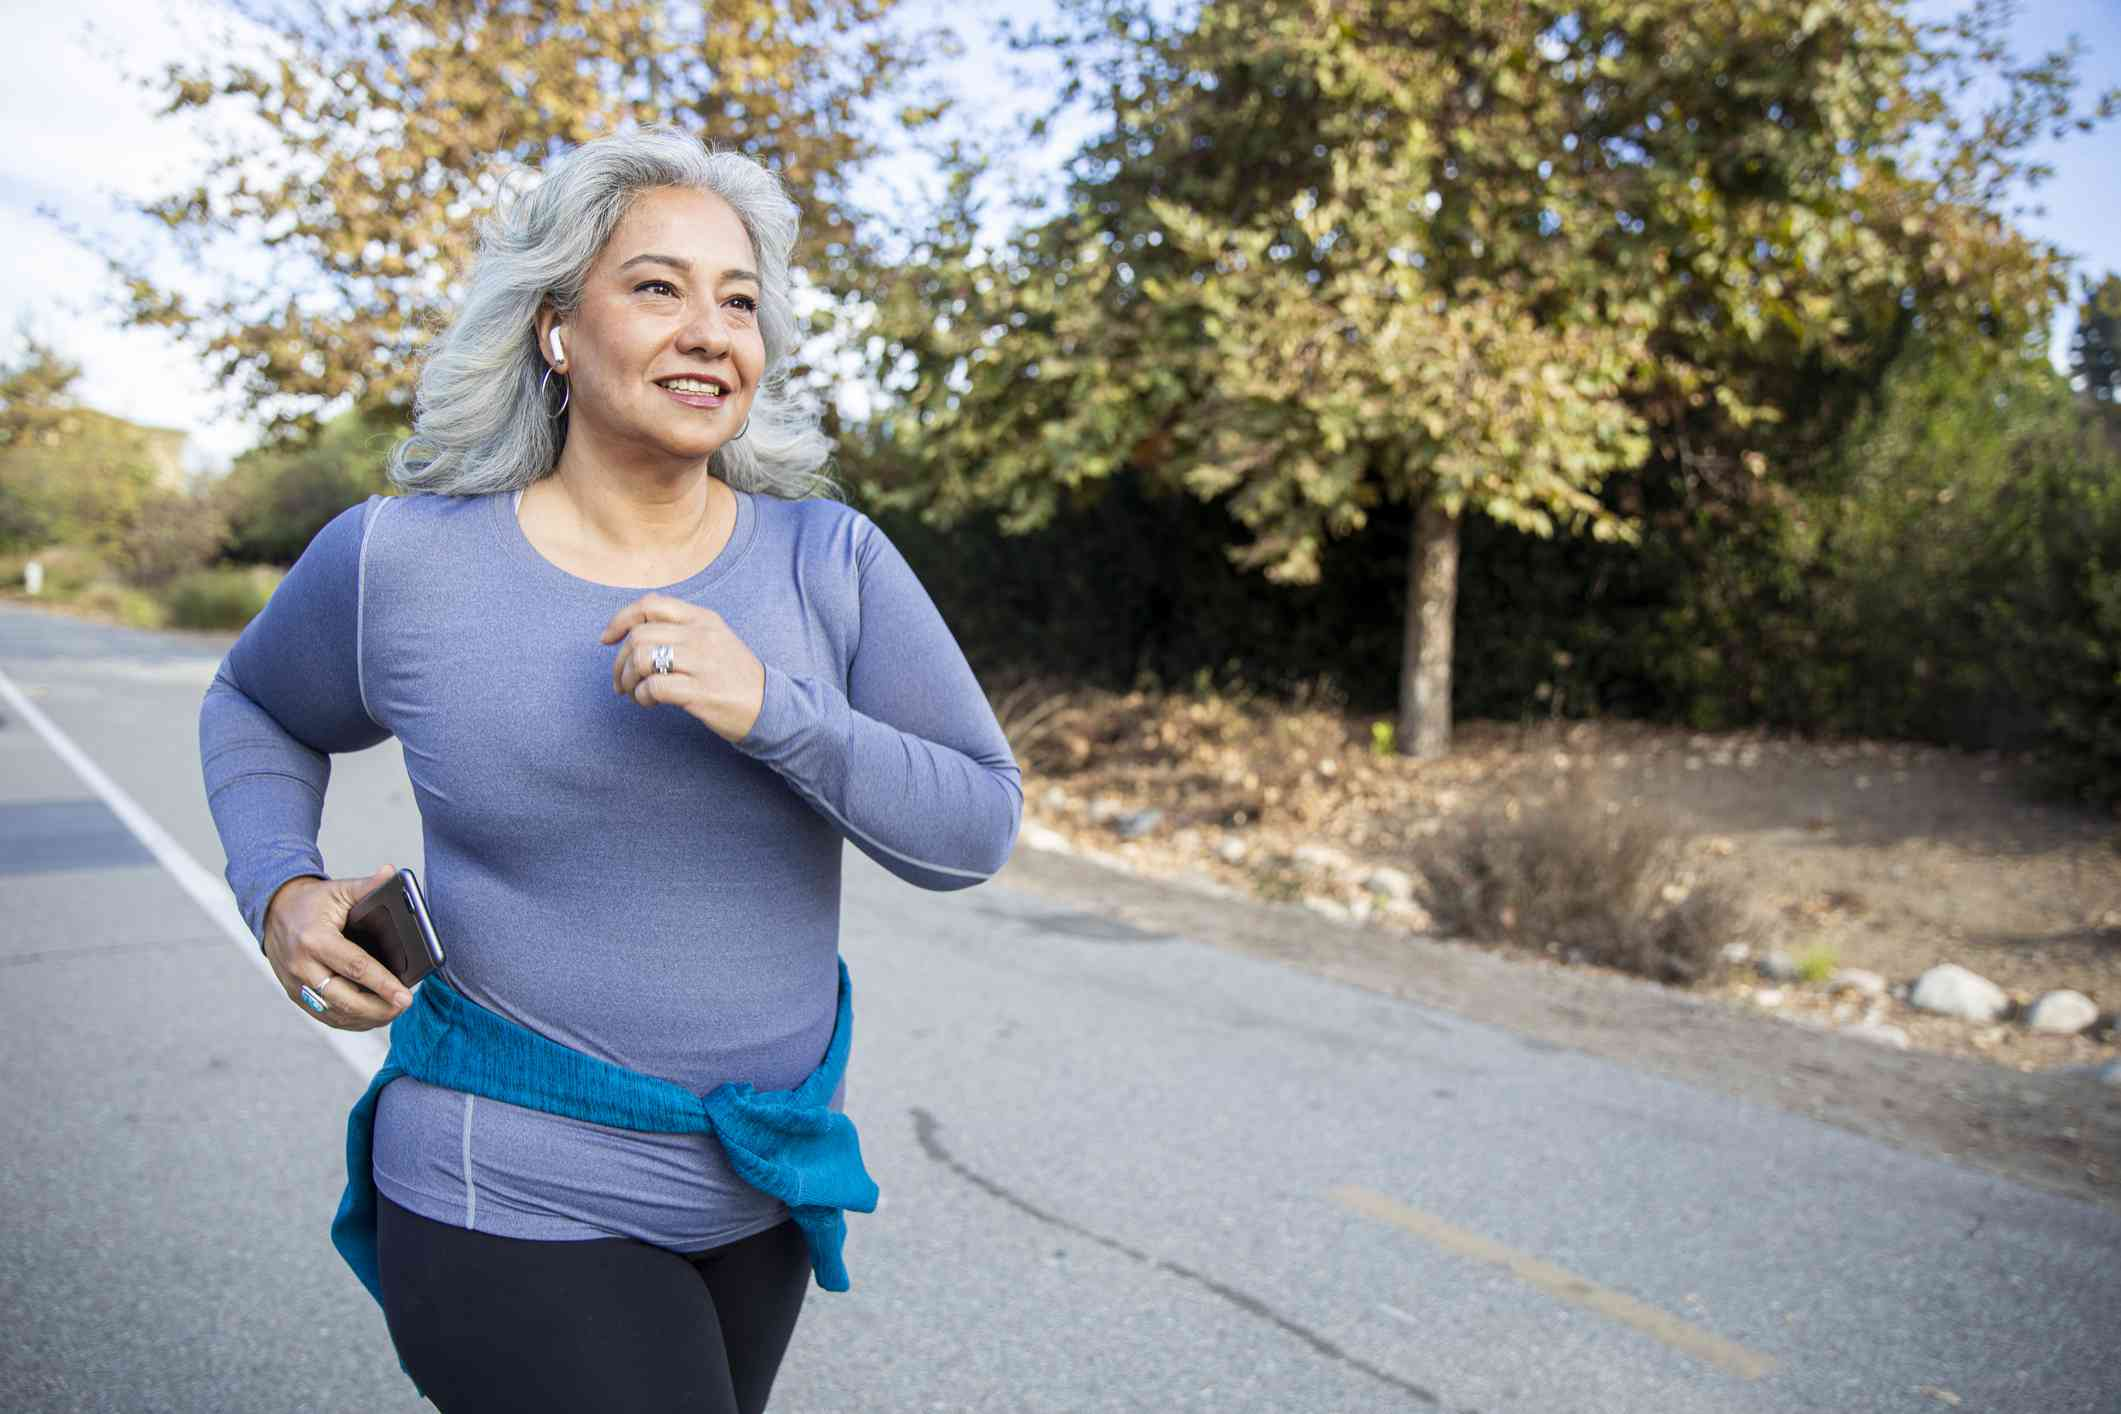 Mexican Woman Jogging